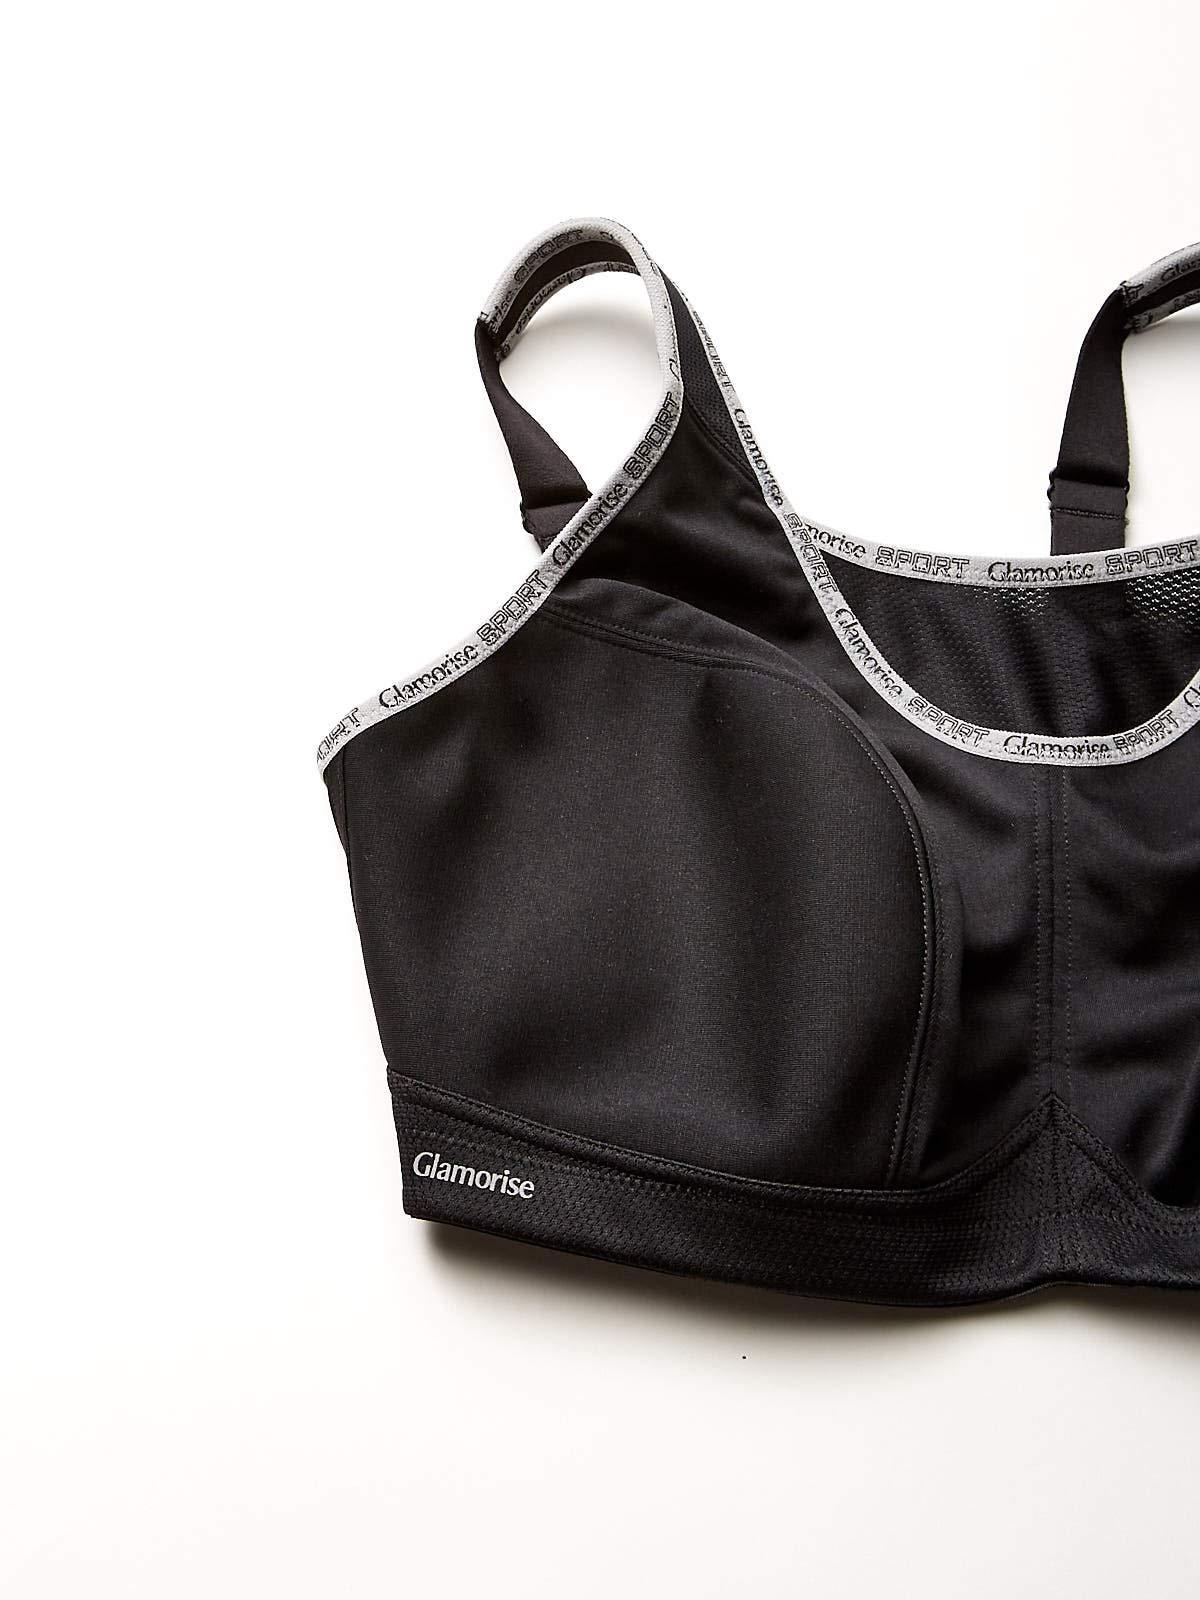 Glamorise Women's Plus-size Full Figure No-Bounce Camisole Wirefree Sports Bra #1066 Bra , BLACK PRINT 34I by Glamorise